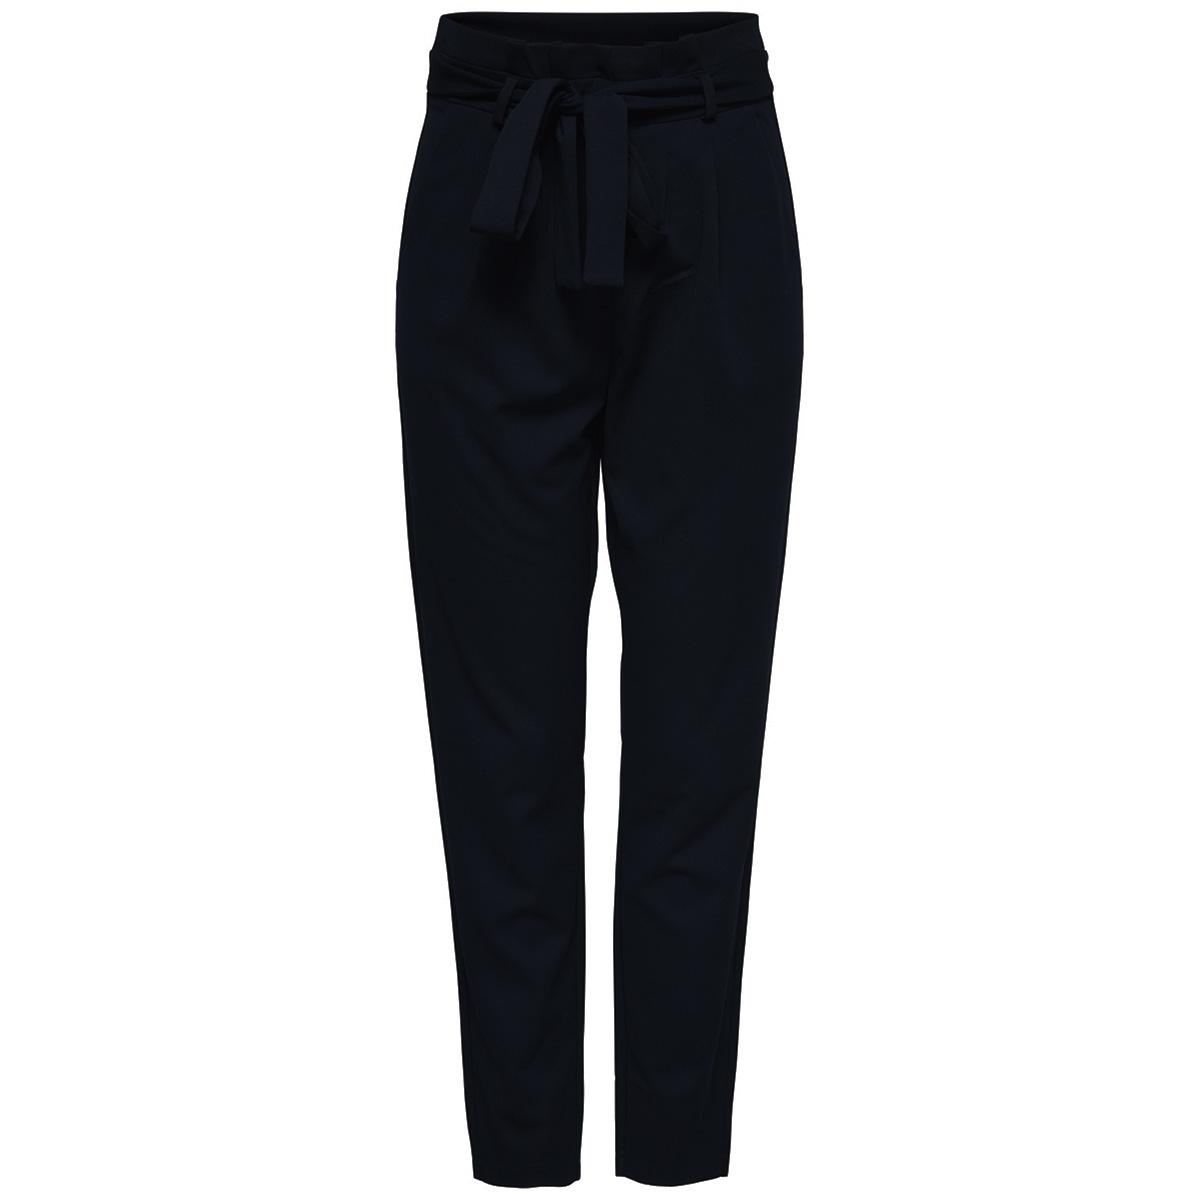 jdytanja pant jrs 15168316 jacqueline de yong broek black/dtm zipper